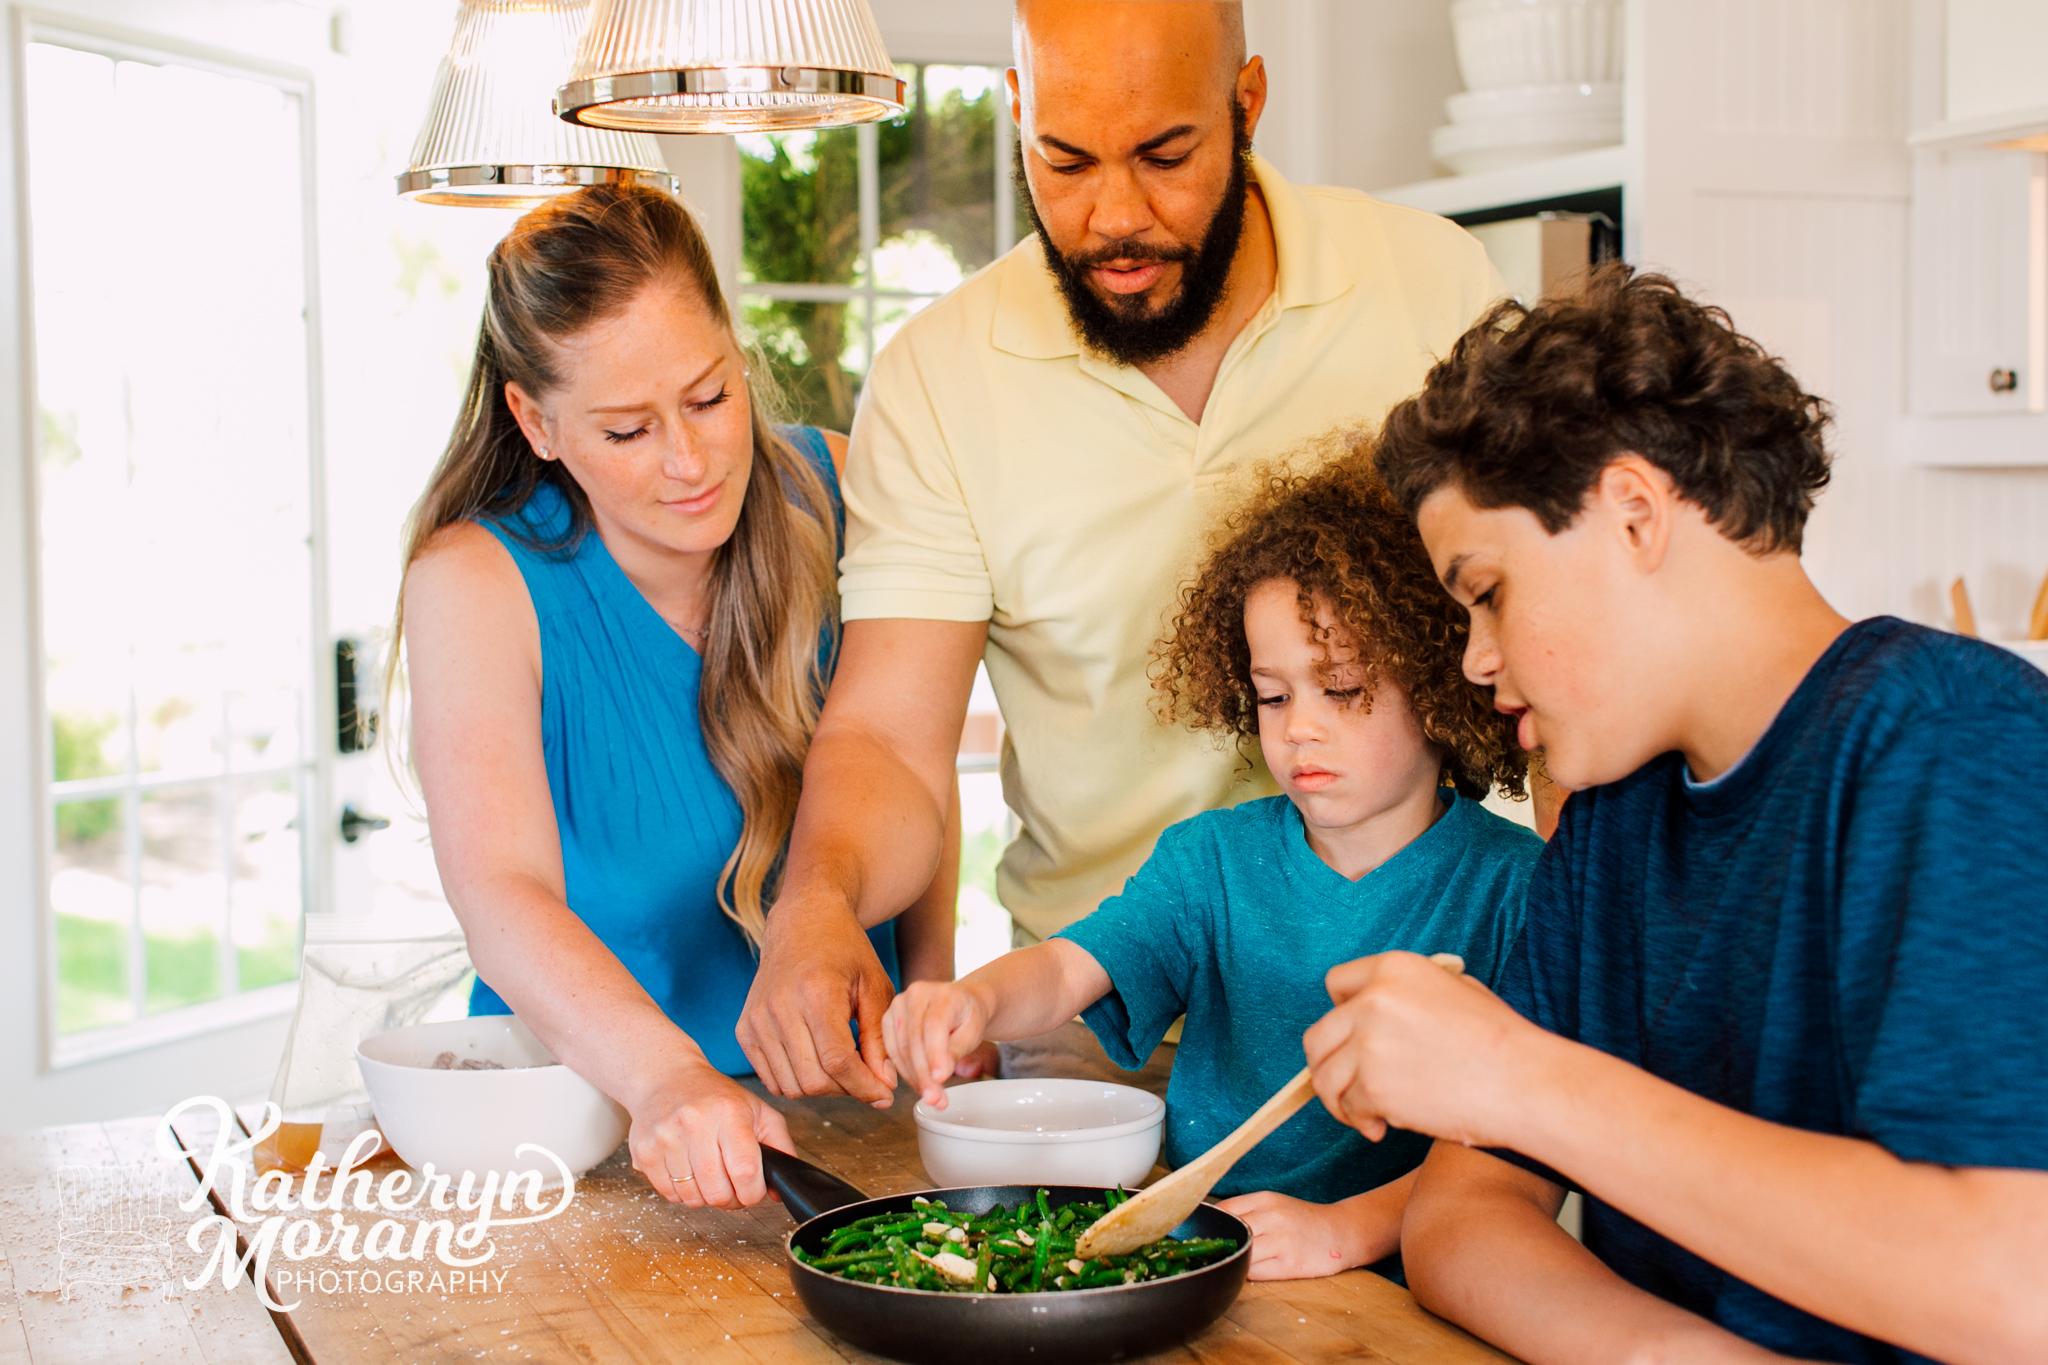 dream-dinners-lifestyle-session-katheryn-moran-2019-33.jpg